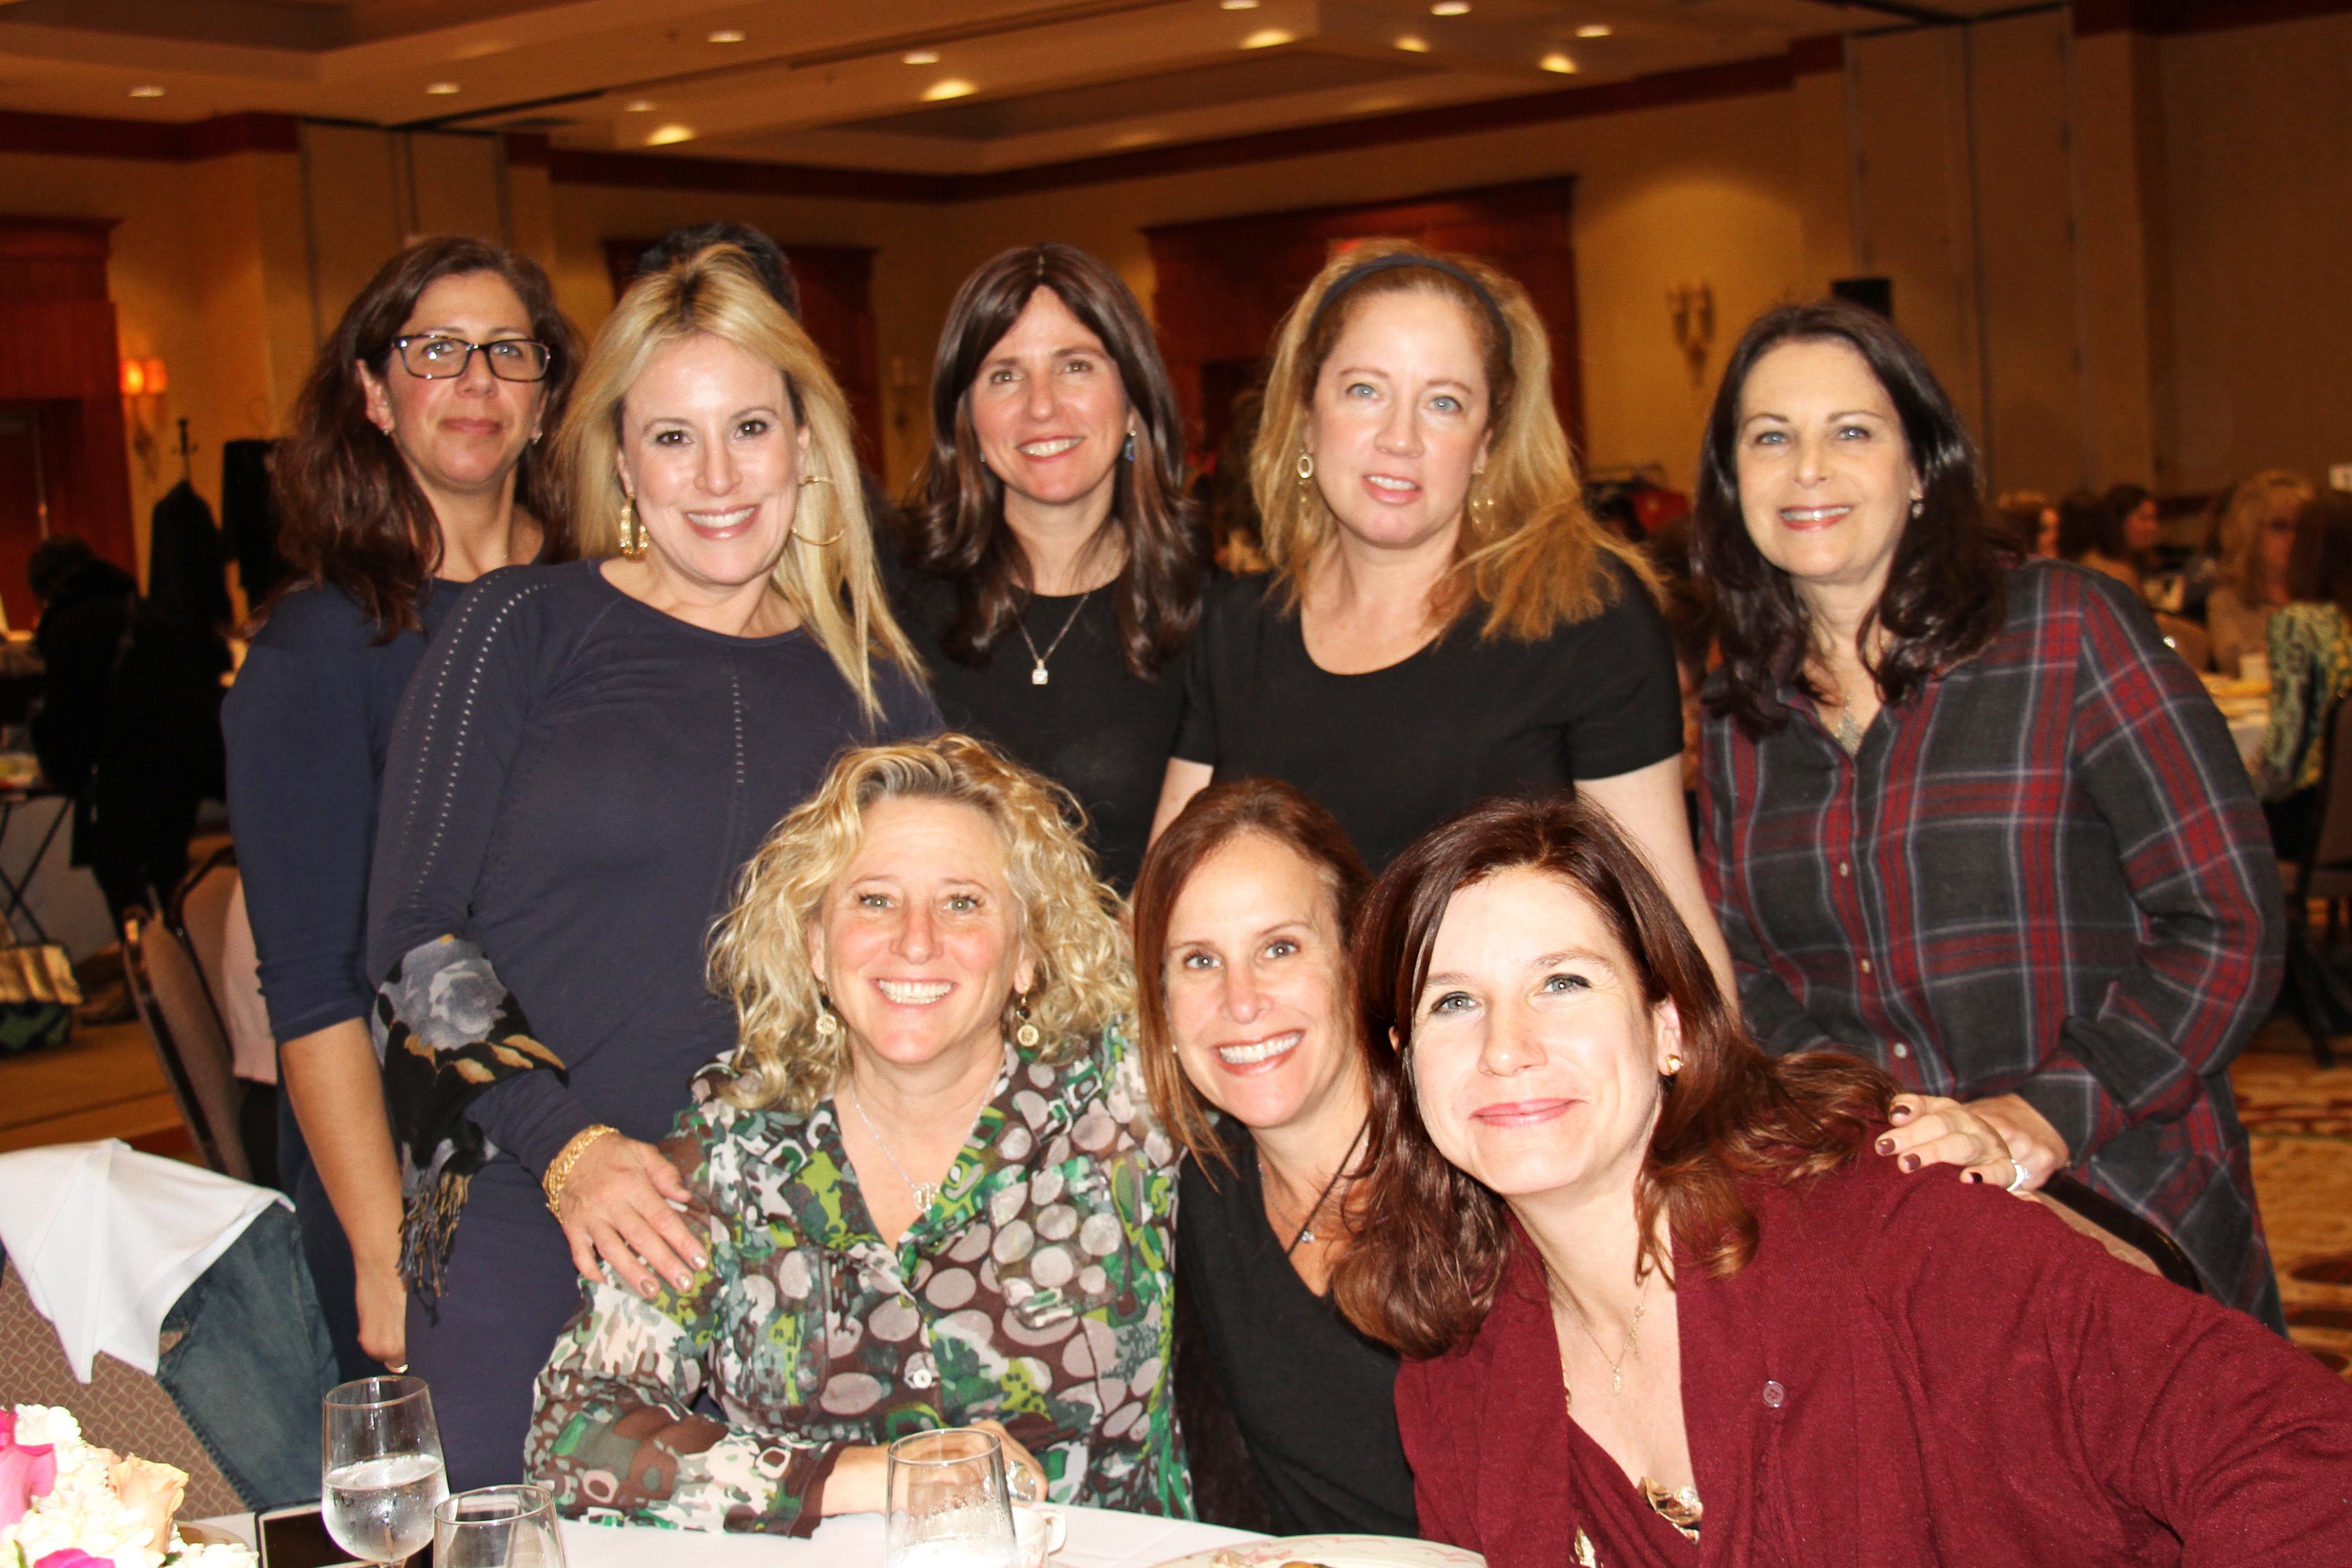 JWI Luncheon Cover Photo - Aish LA Website